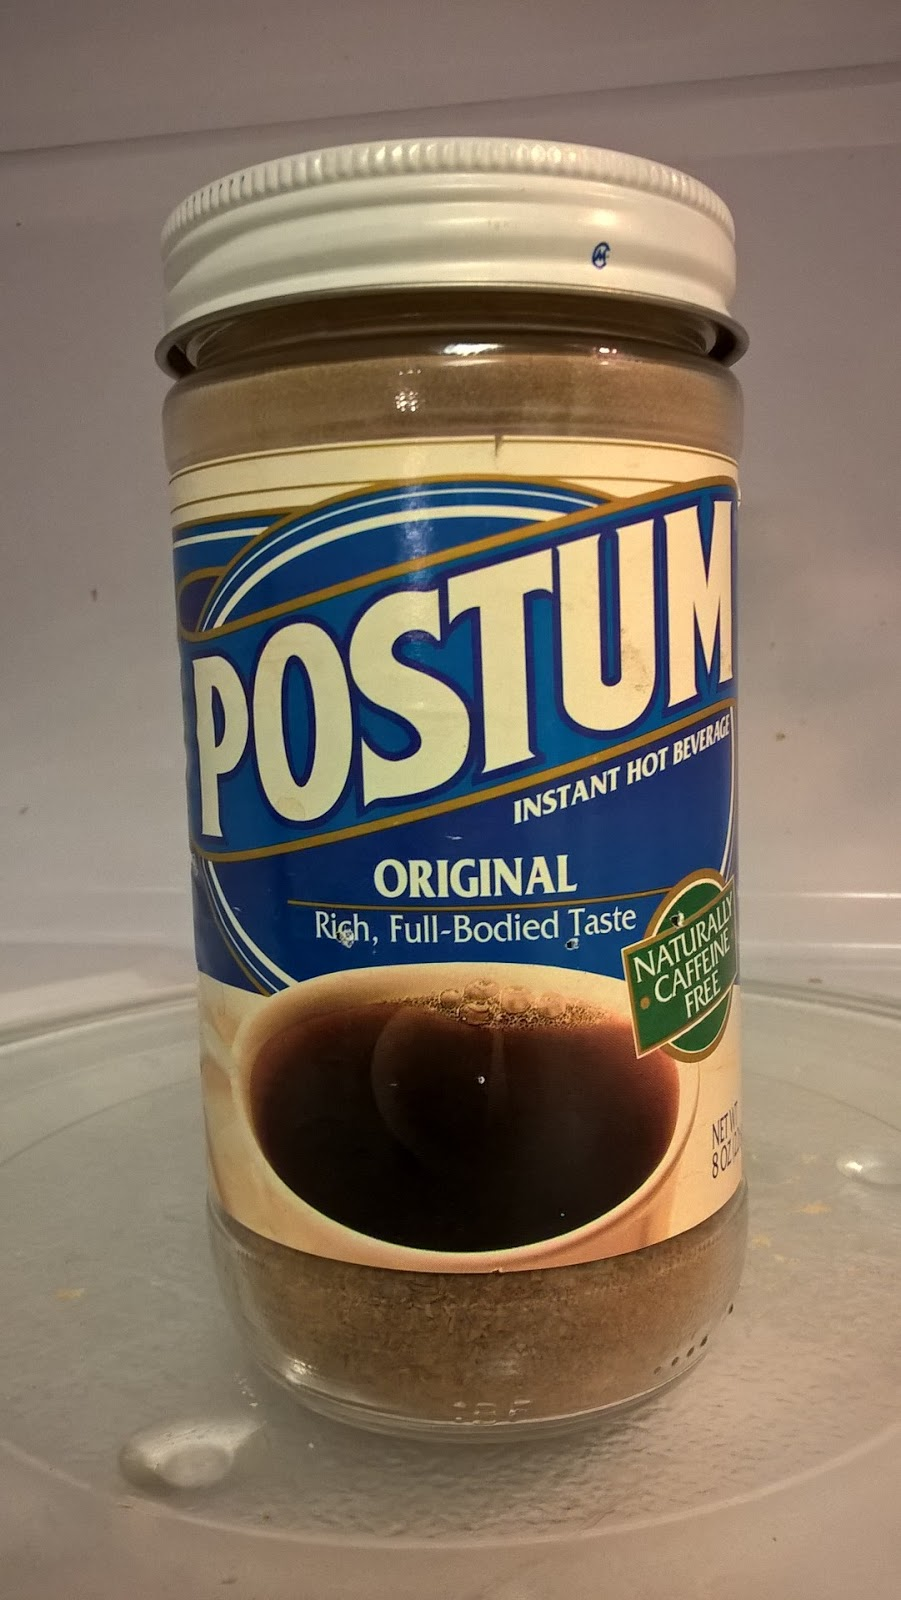 Postum Hot Drink